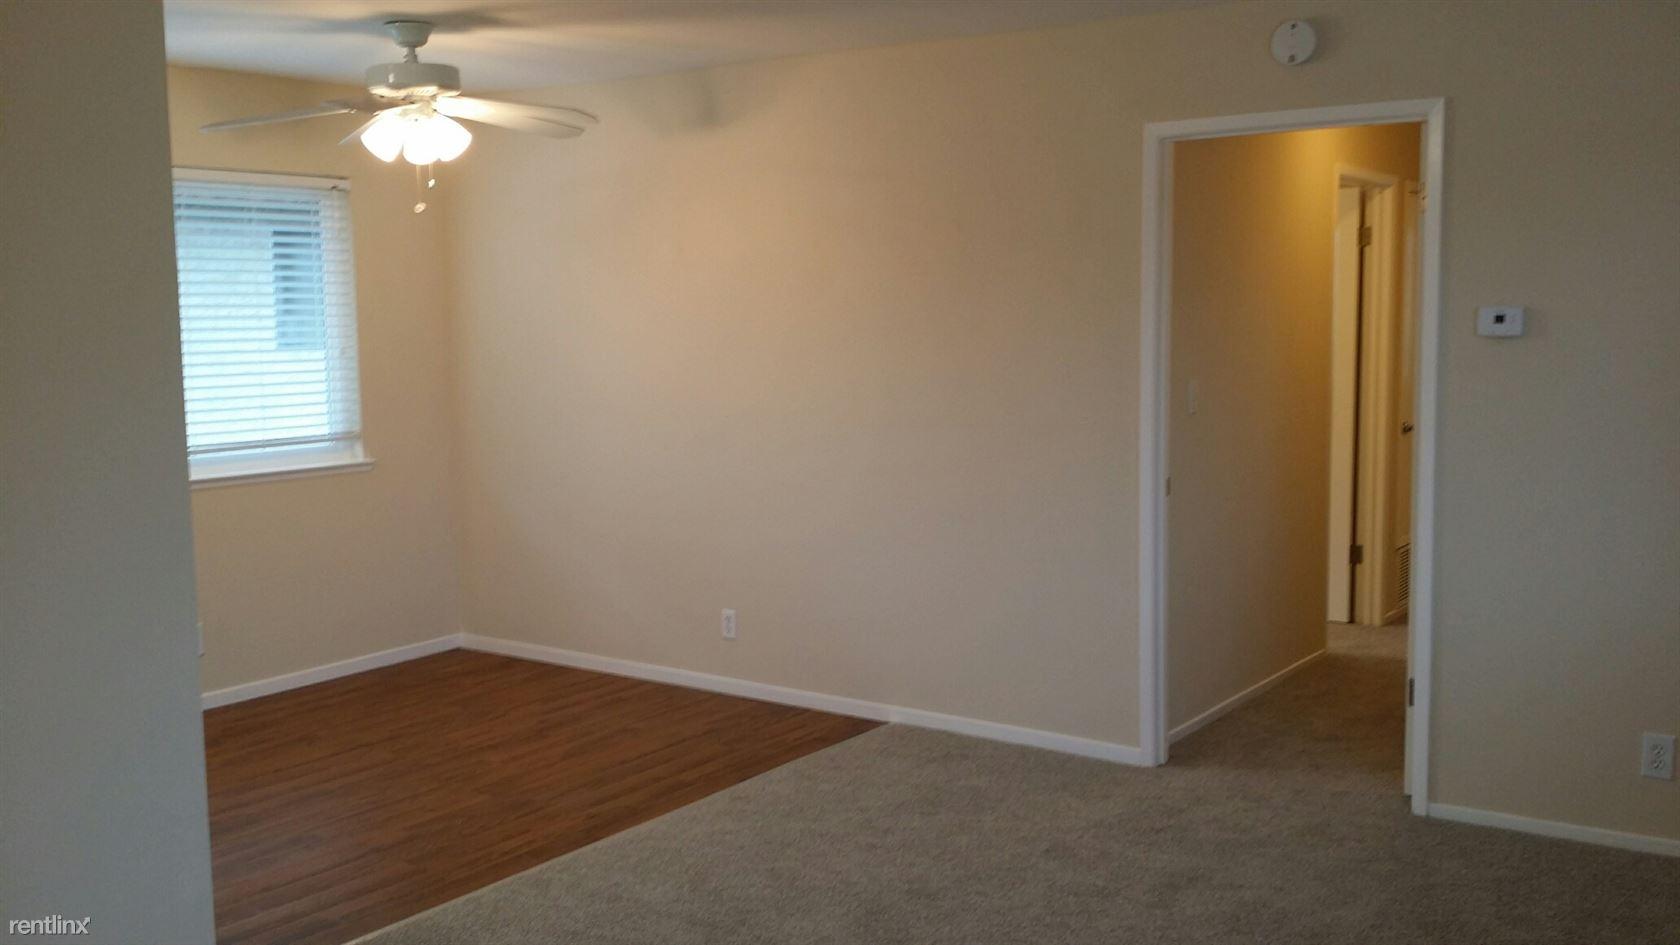 447_4 Living room_dining room_hallway